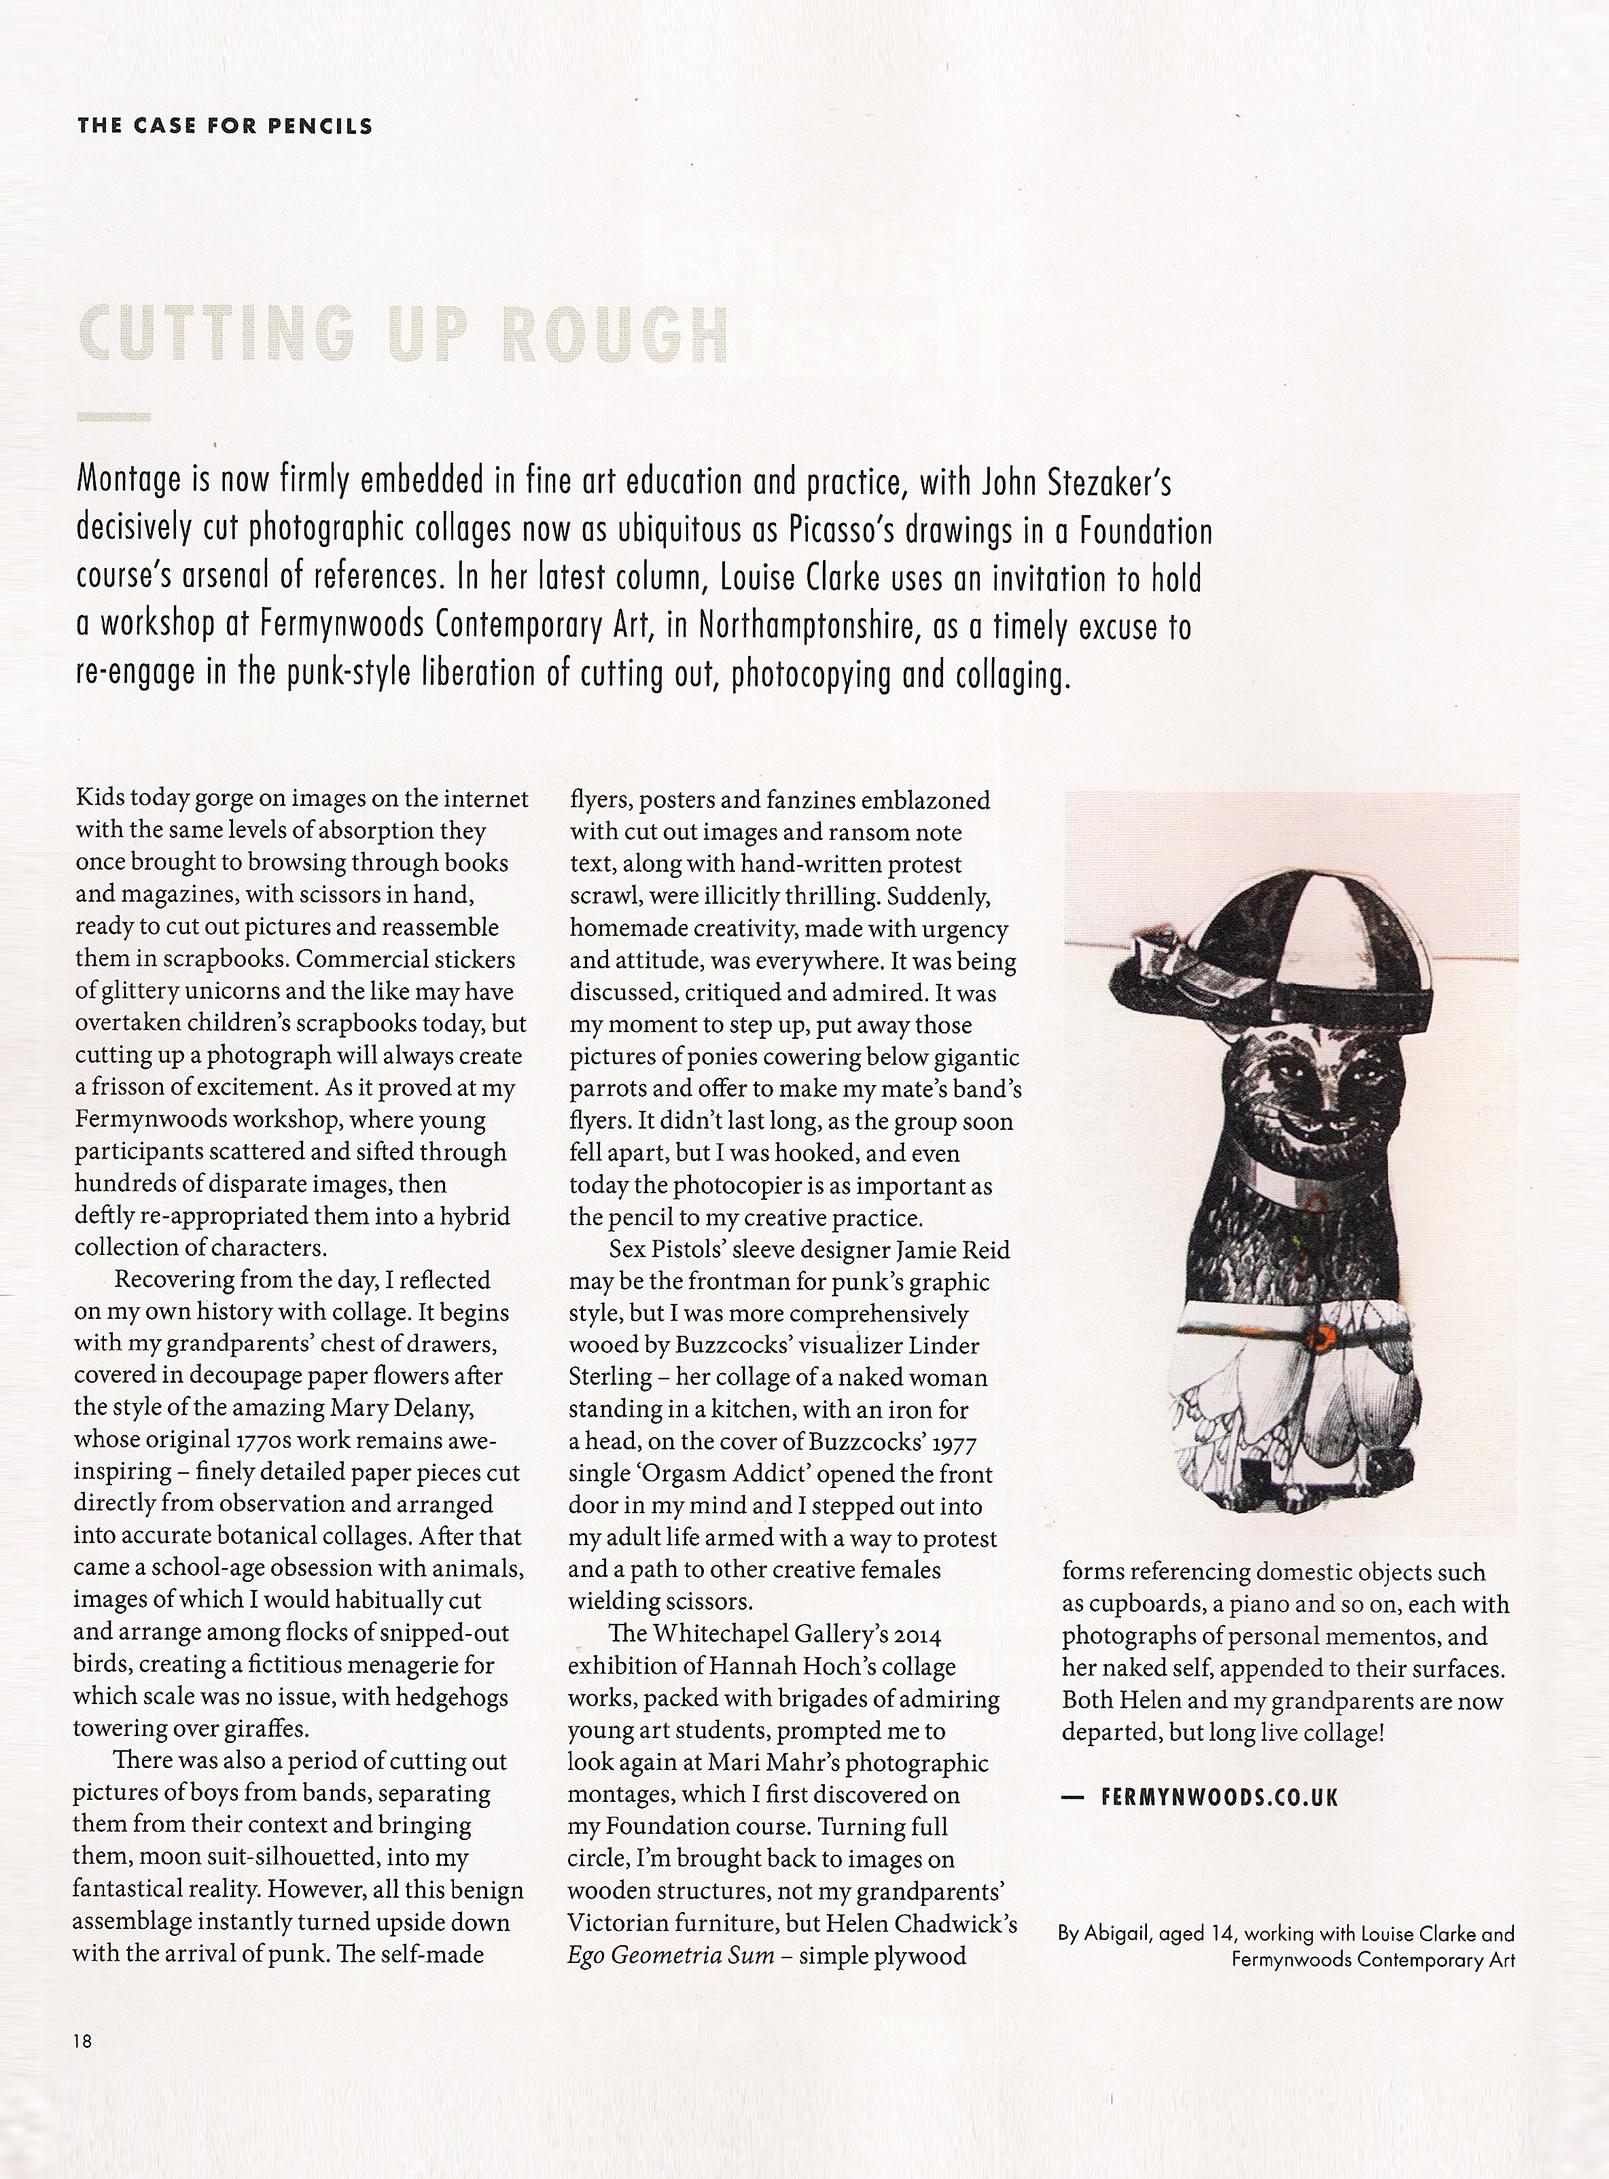 Saatchi Gallery Magazine feature